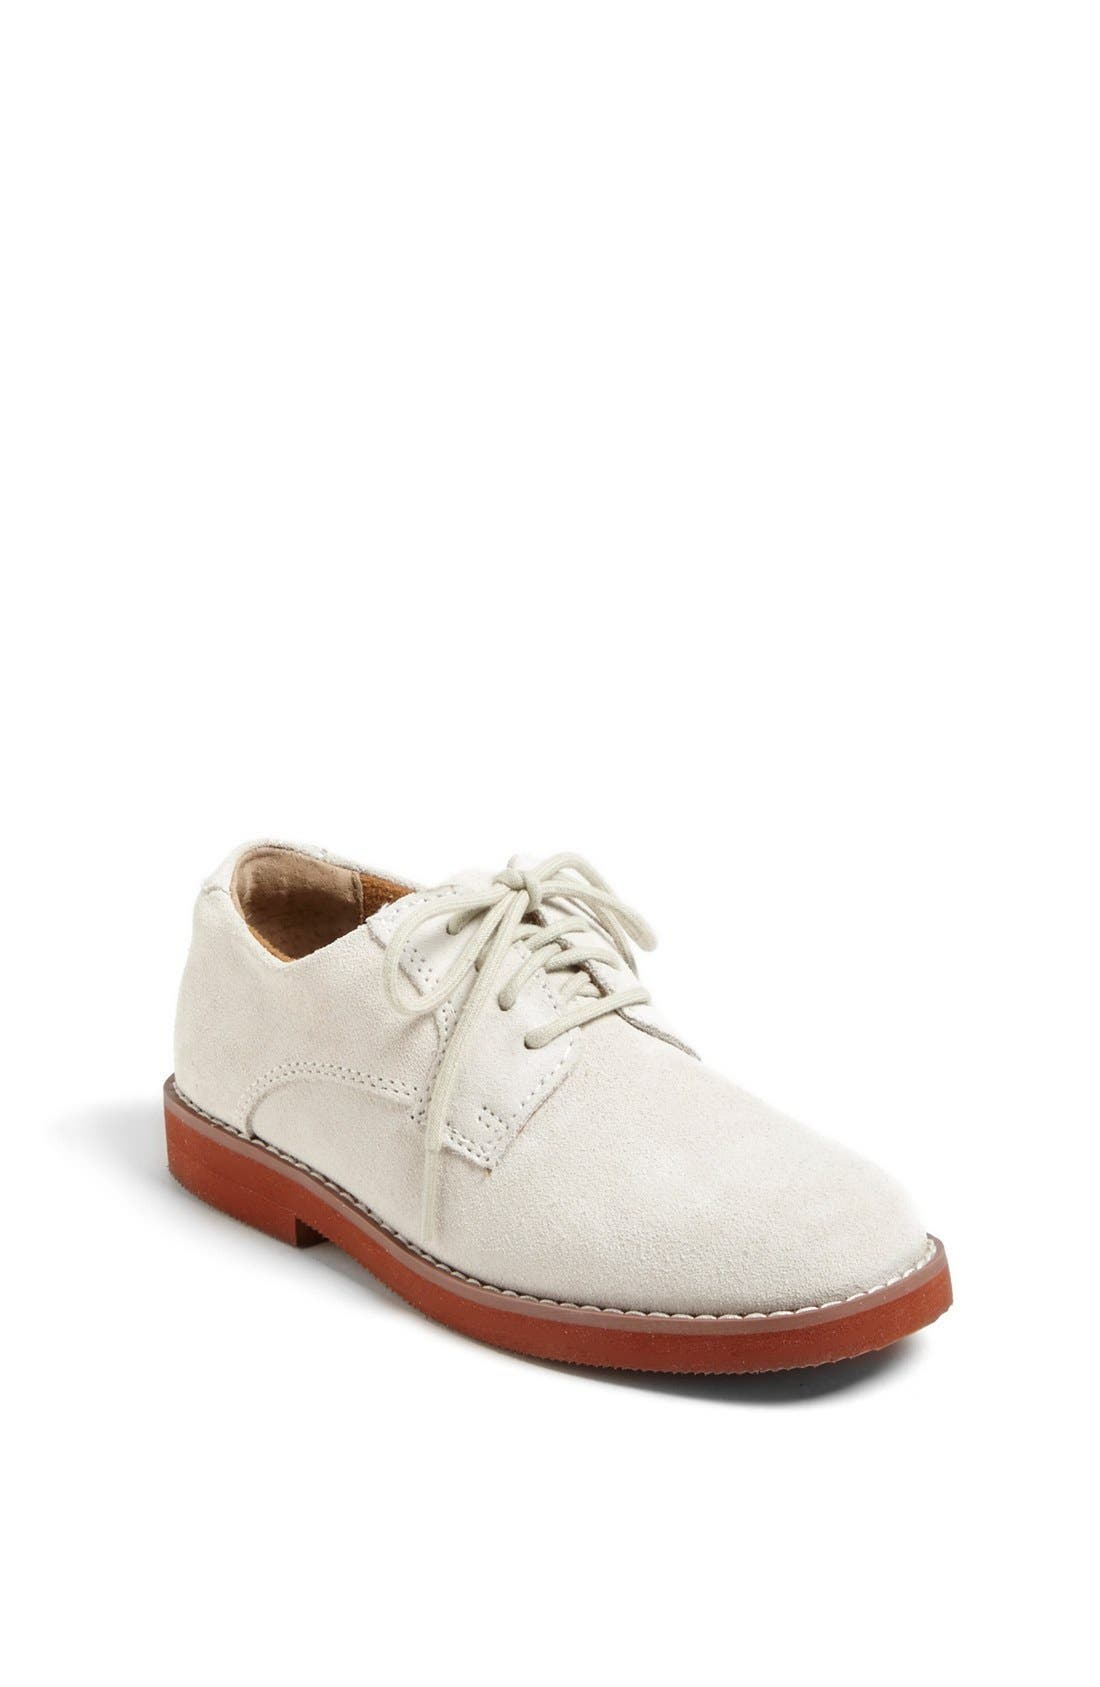 'Kearny' Oxford,                         Main,                         color, White